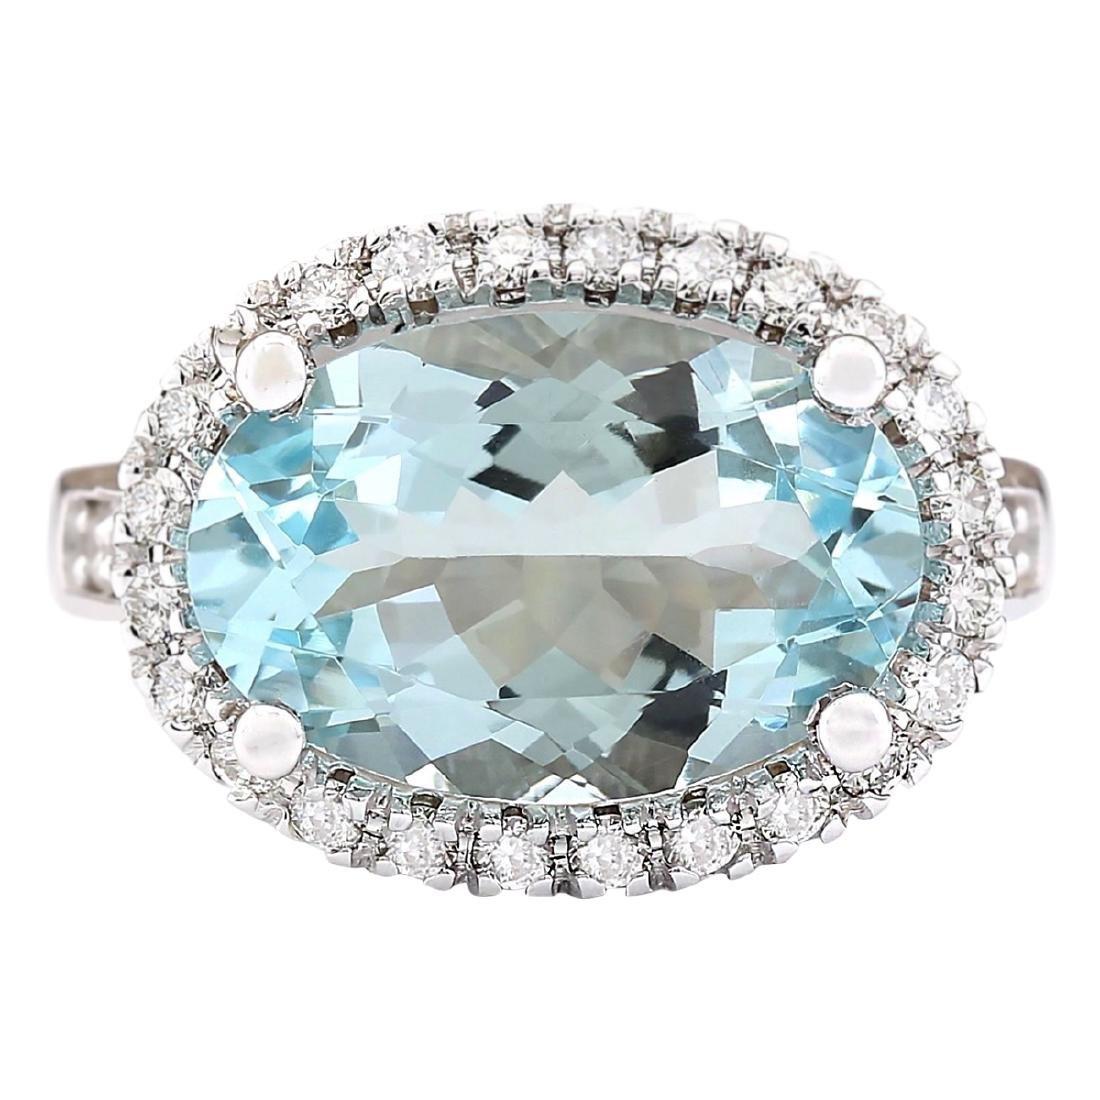 6.04 CTW Natural Aquamarine And Diamond Ring In 18K